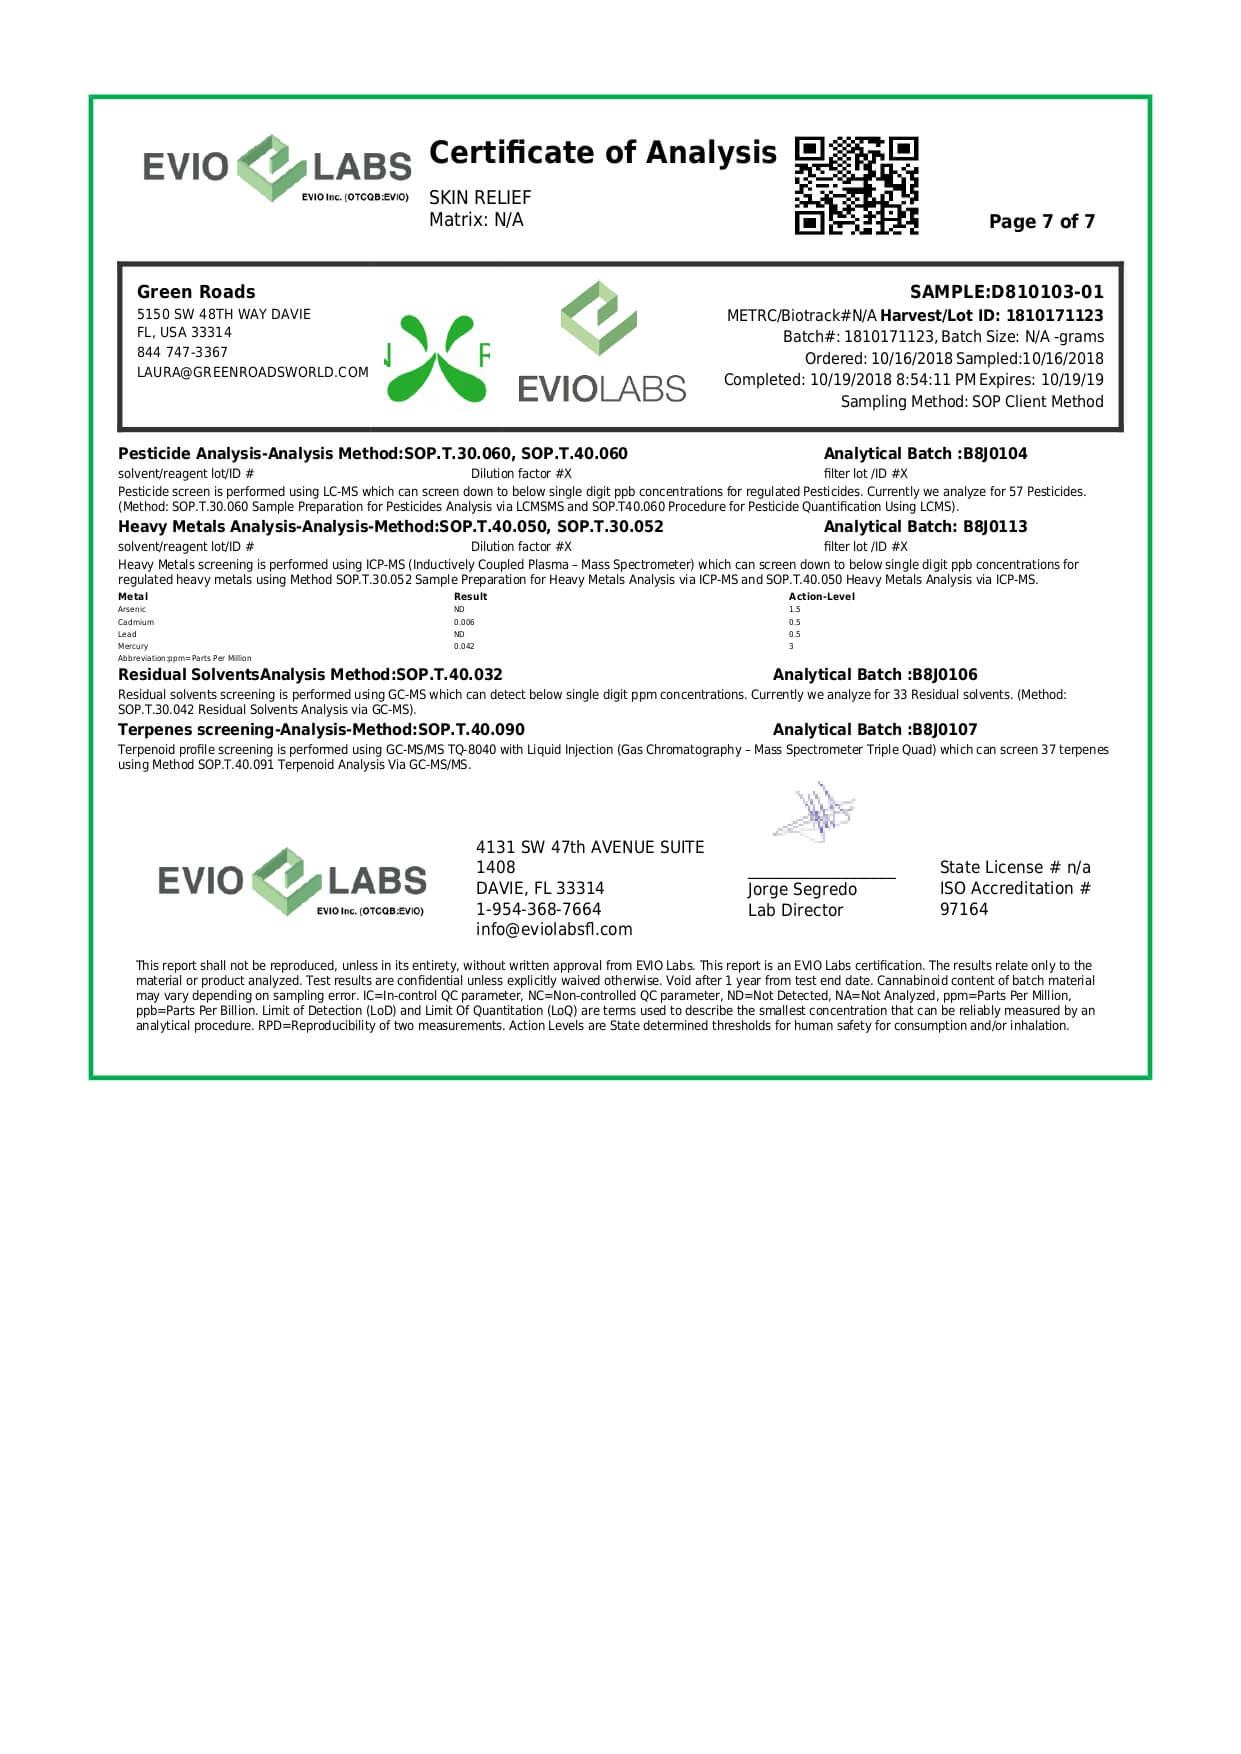 Green Roads CBD Topical Skin Relief Cream Lab Report